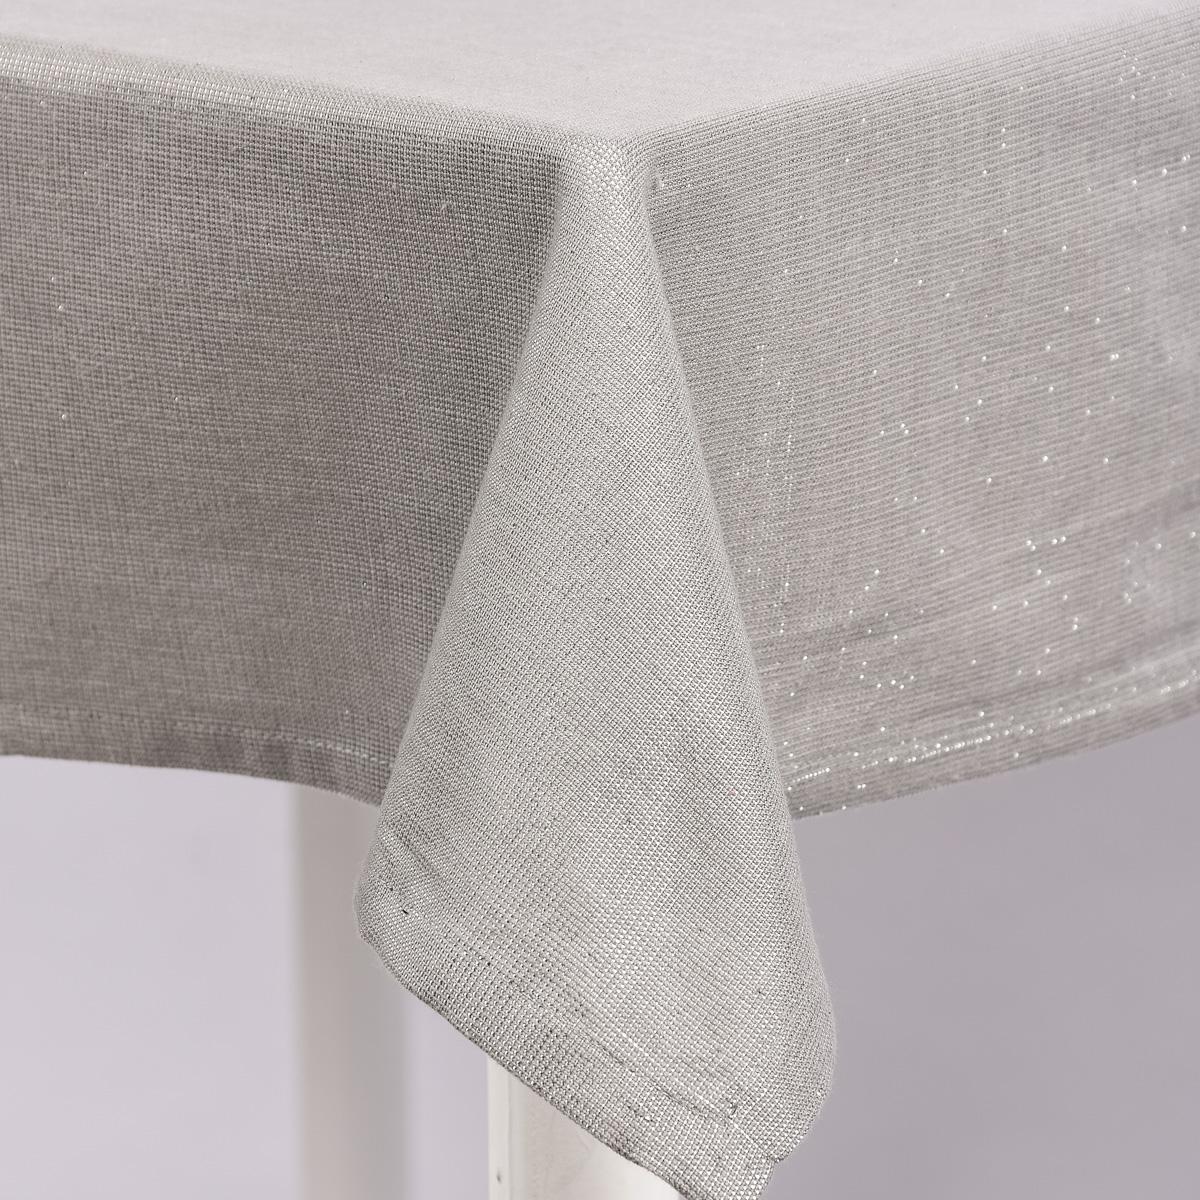 Tischdecke Glamour grau silberfarbig Lurex 150x250cm